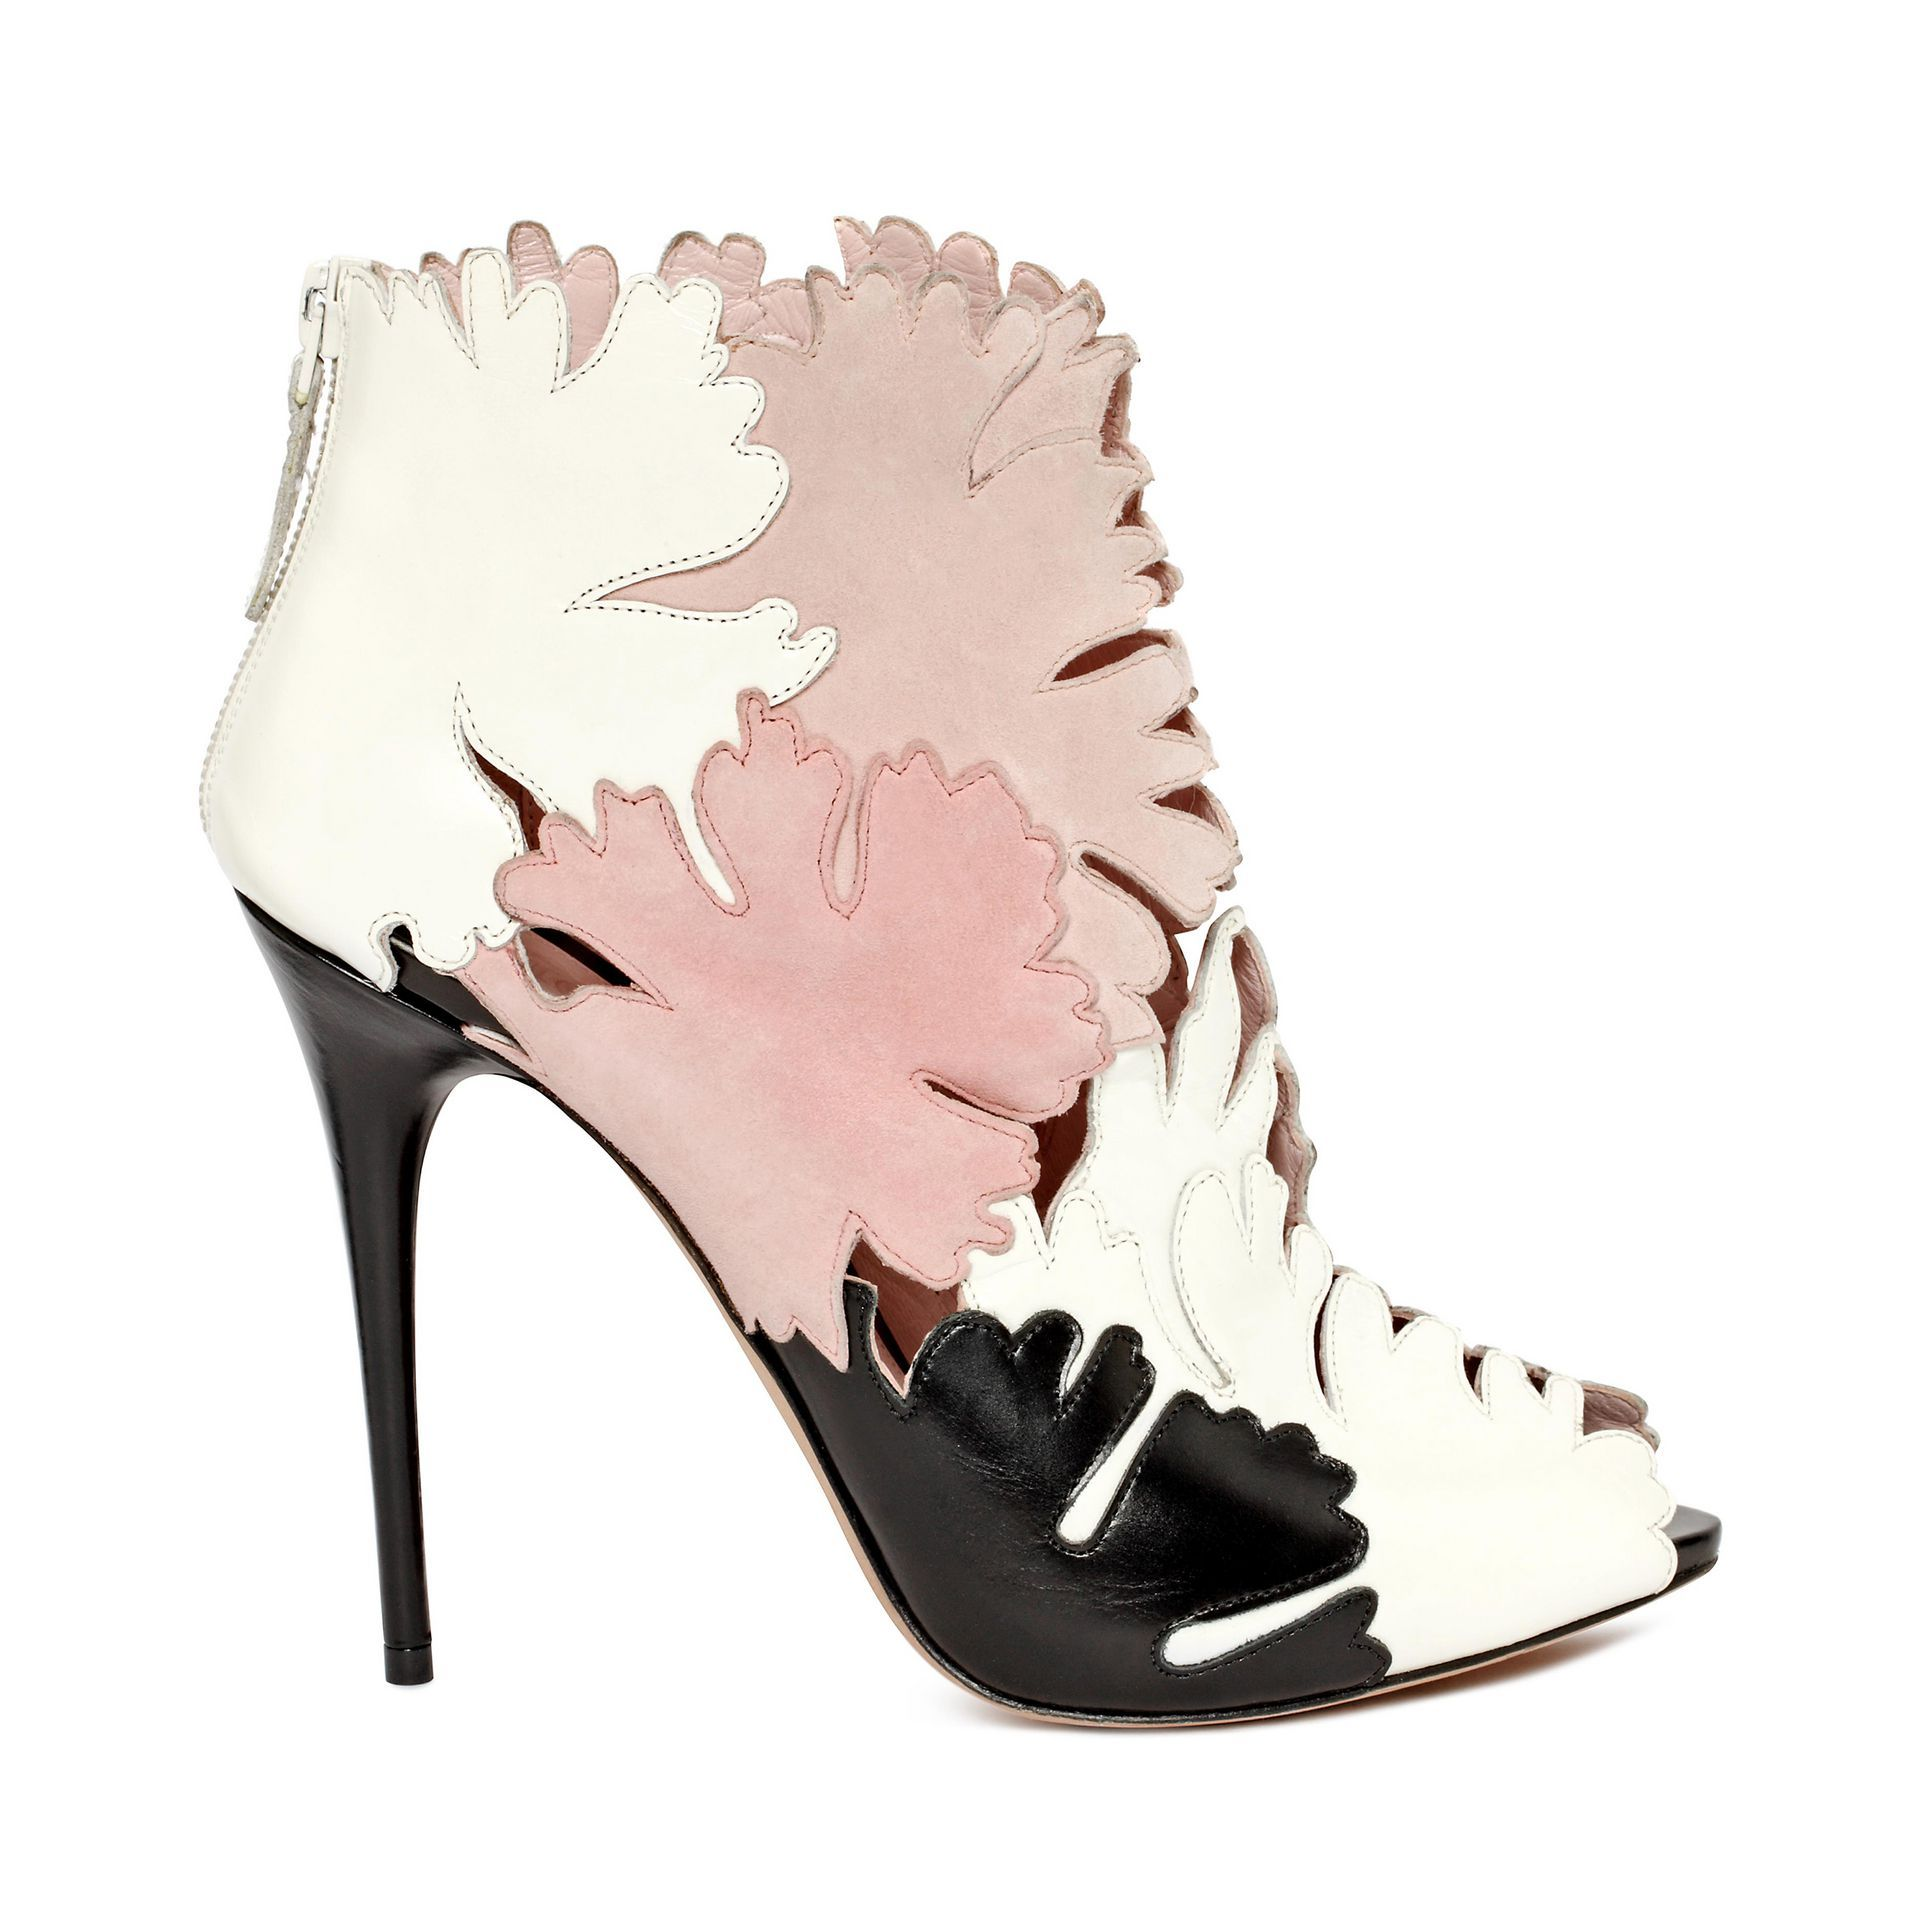 Women's Peep Toe Fashion Stiletto Heel Booties With Applique